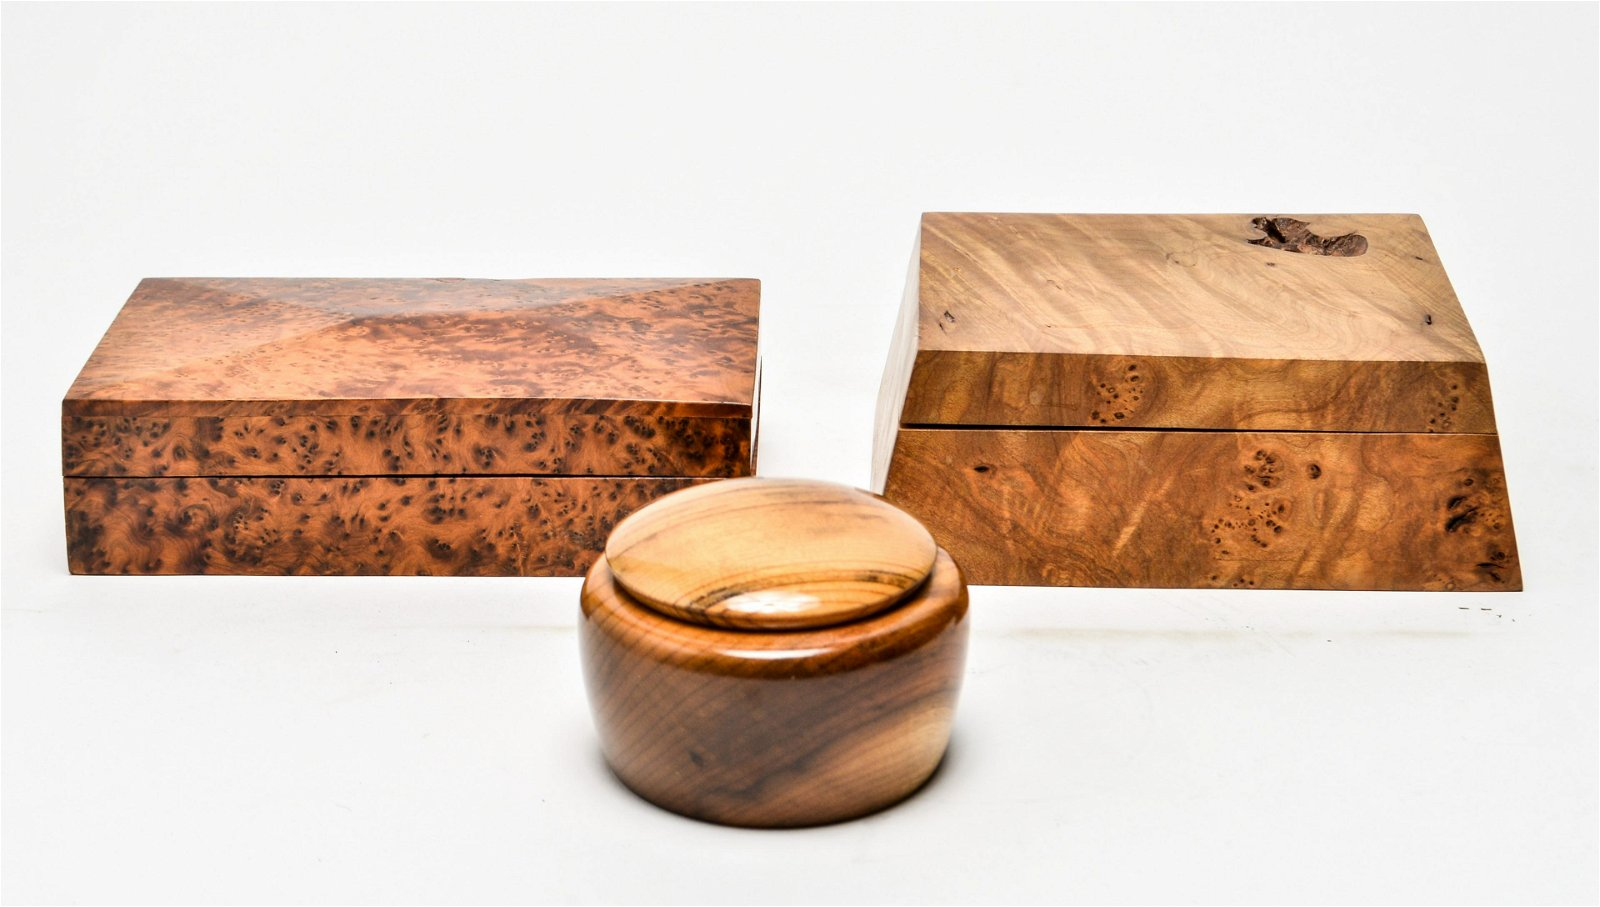 Jewelry Boxes, Burlwood & Myrtle Wood, Group of 3